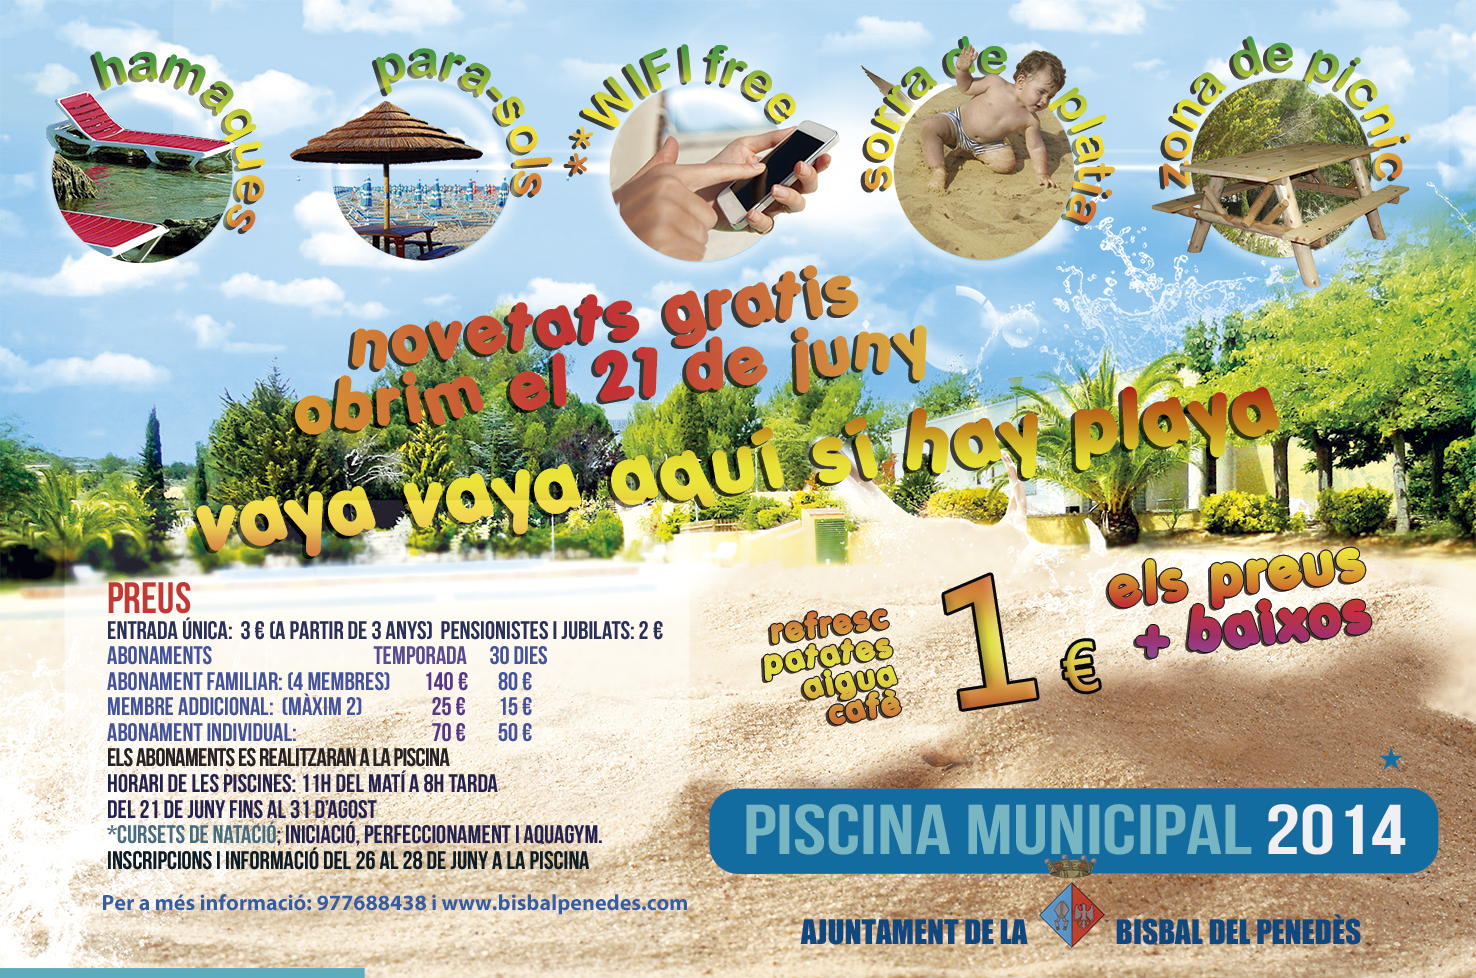 Piscina municipal 2014